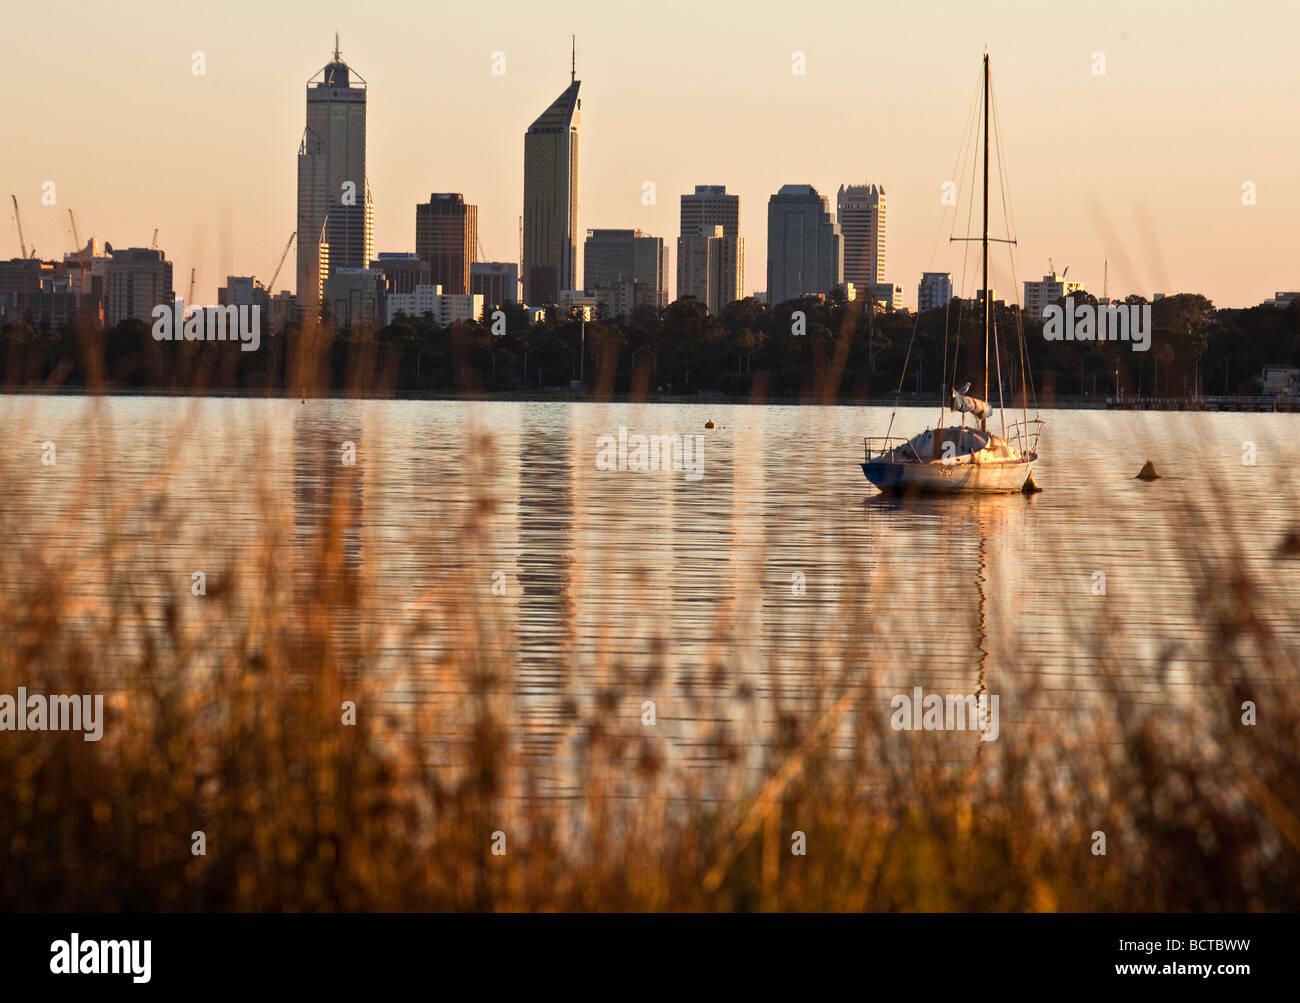 Skyline of Perth with the Swan River, Western Australia, Australia - Stock Image